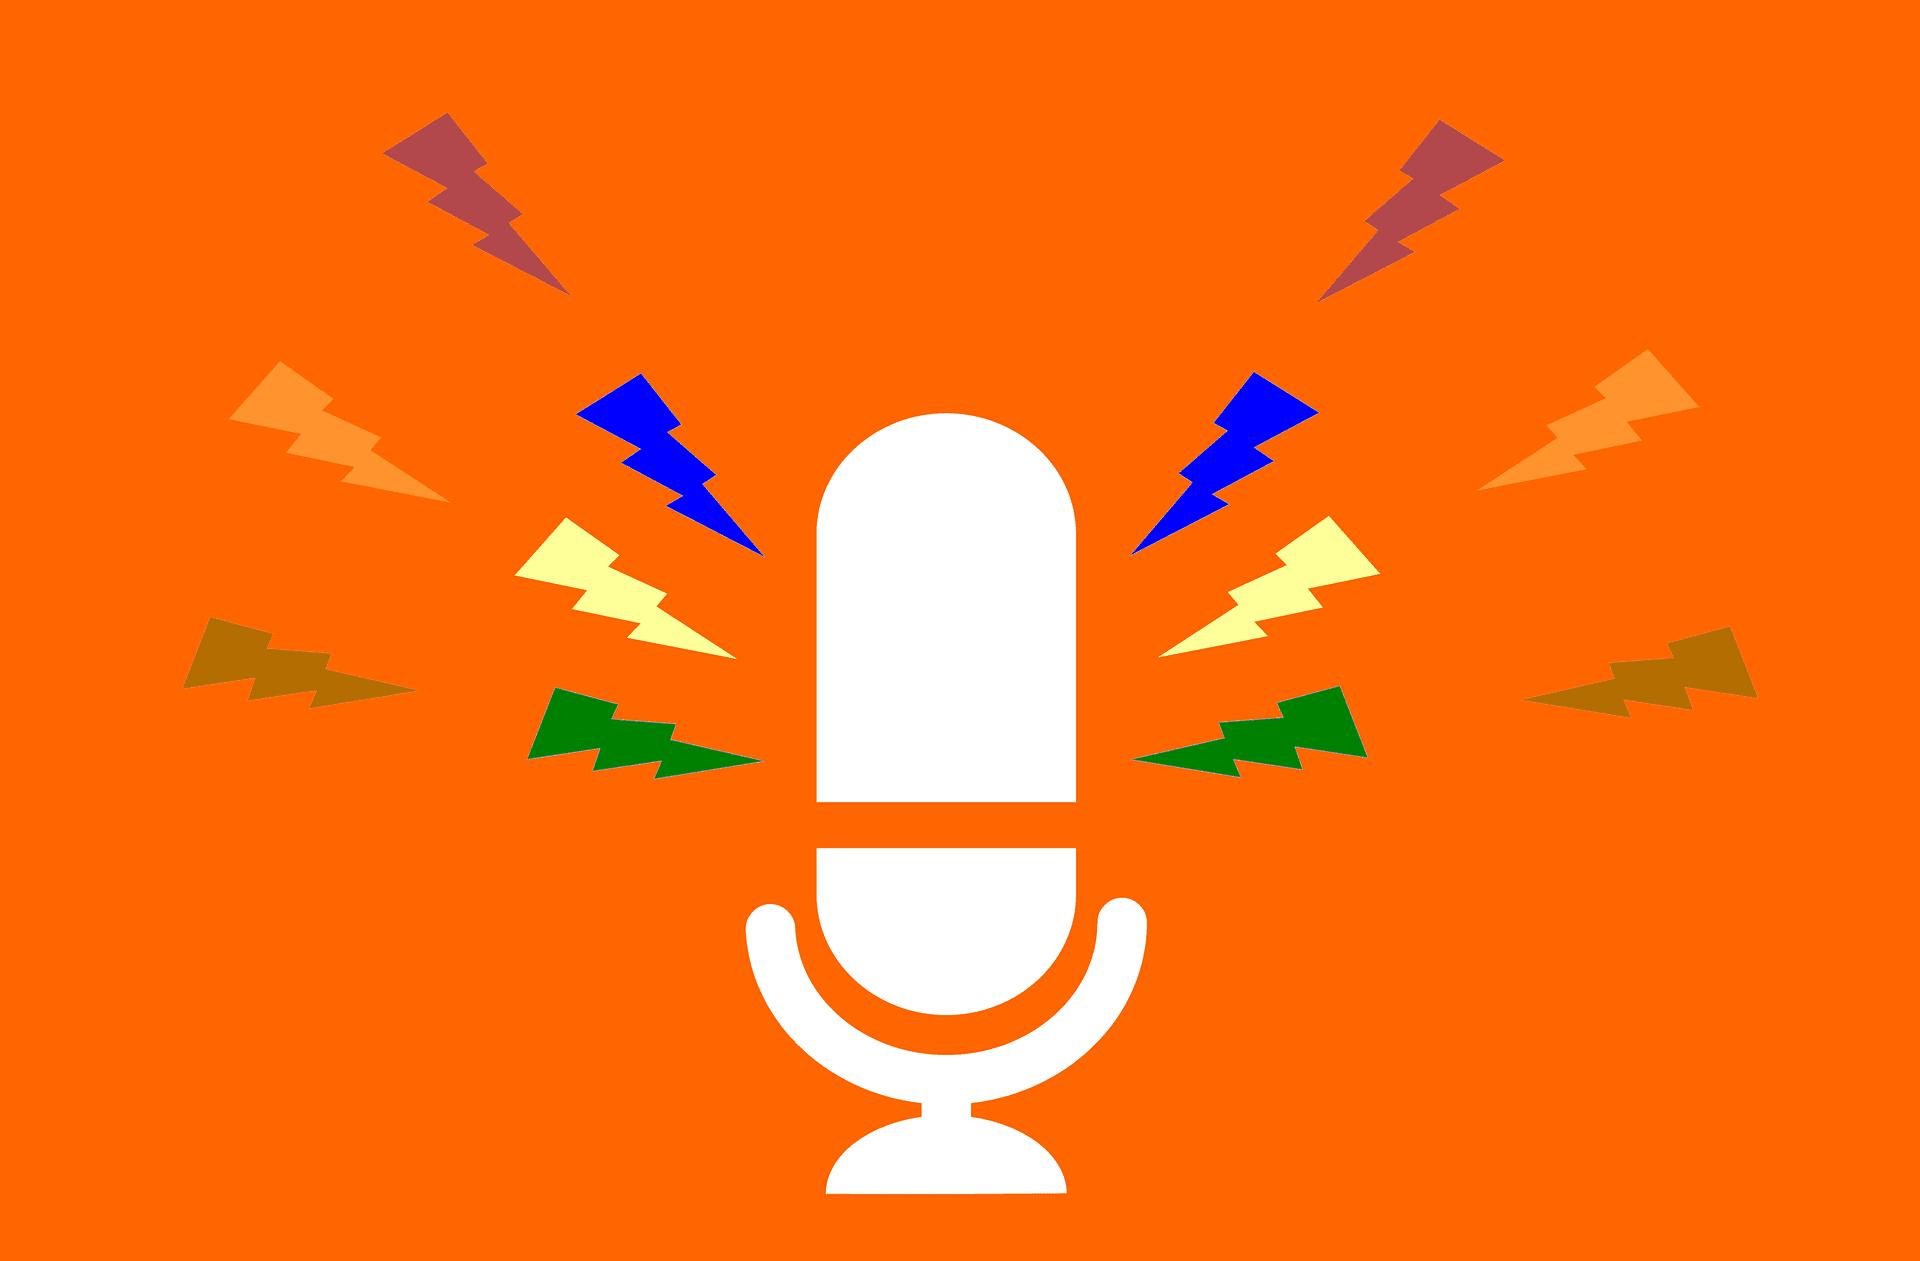 podcast-3332163_1920